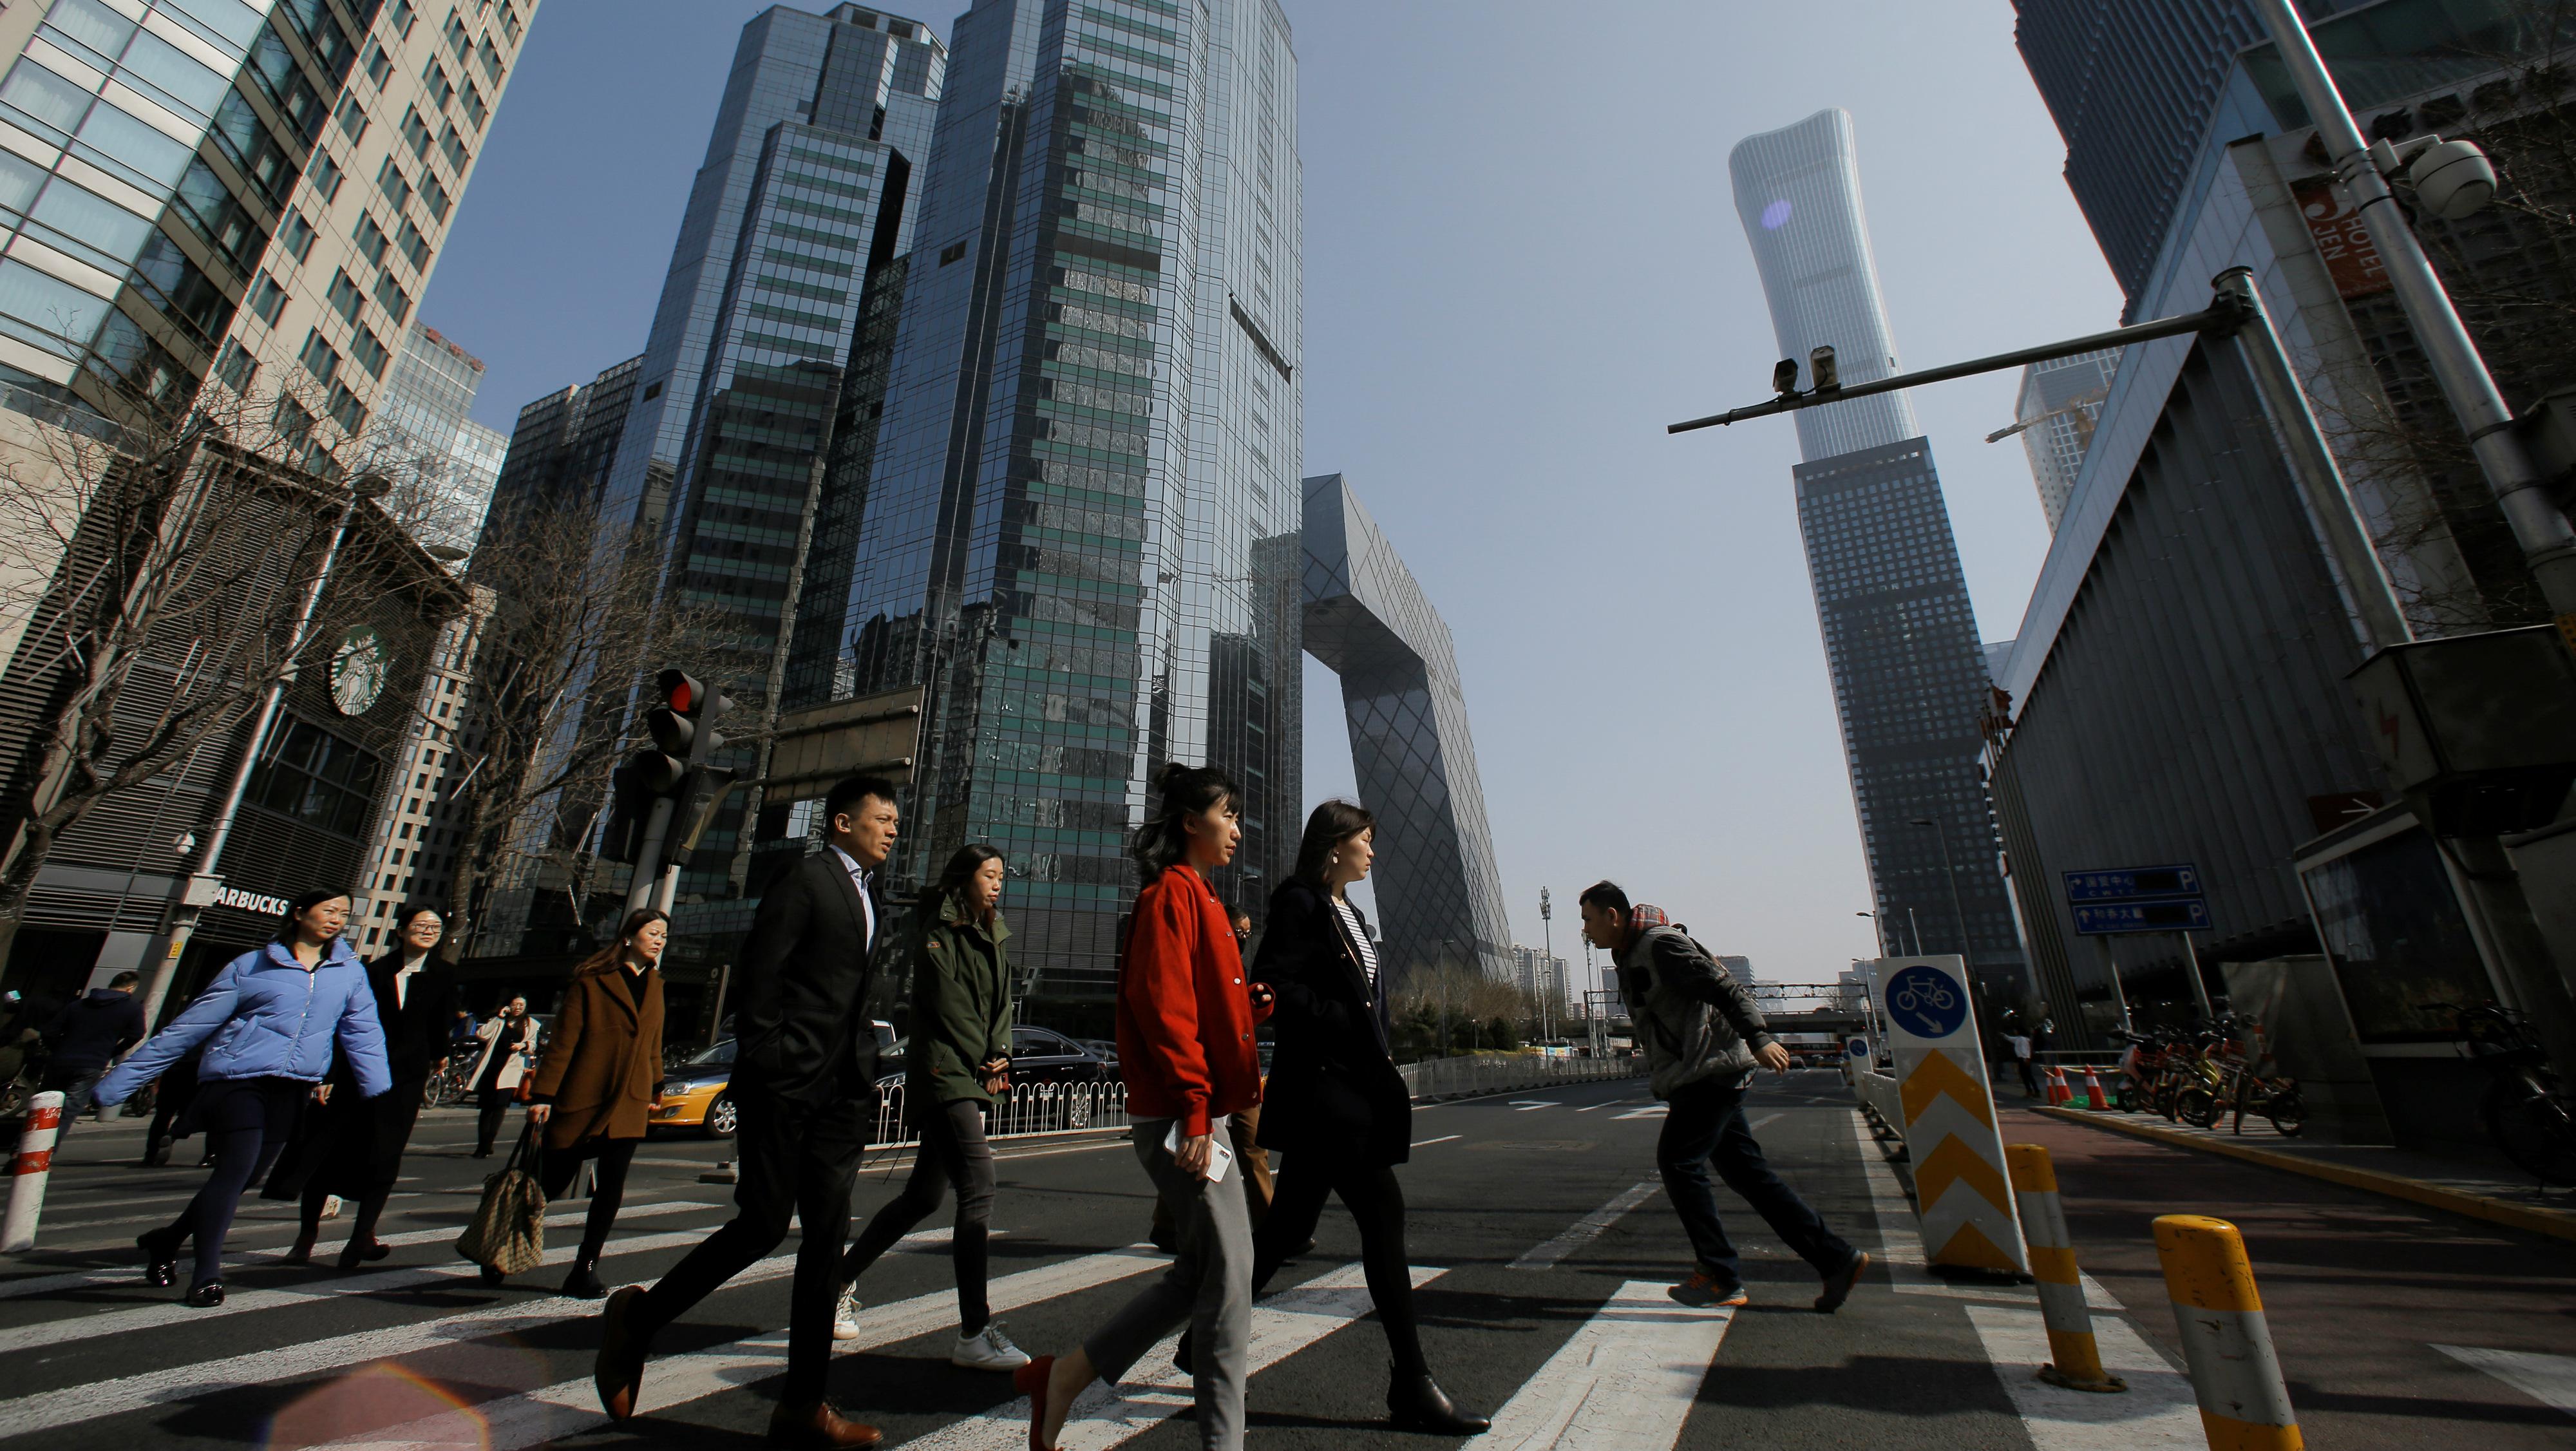 People walking on a street in Beijing, China.